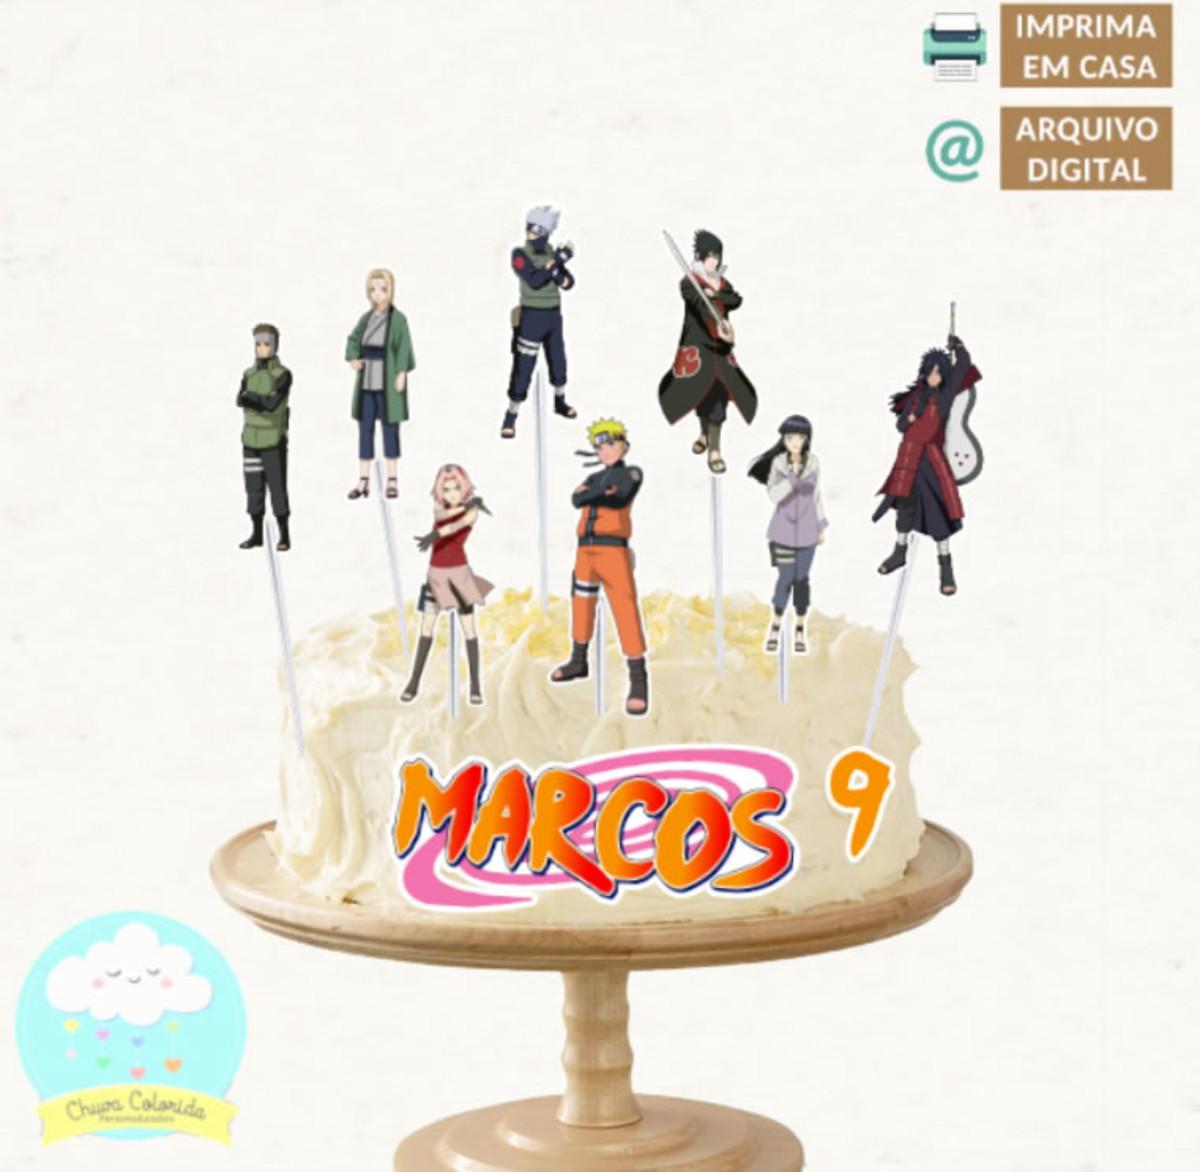 Arquivo Digital Topo Topper De Bolo Scrap Naruto No Elo7 Chuva